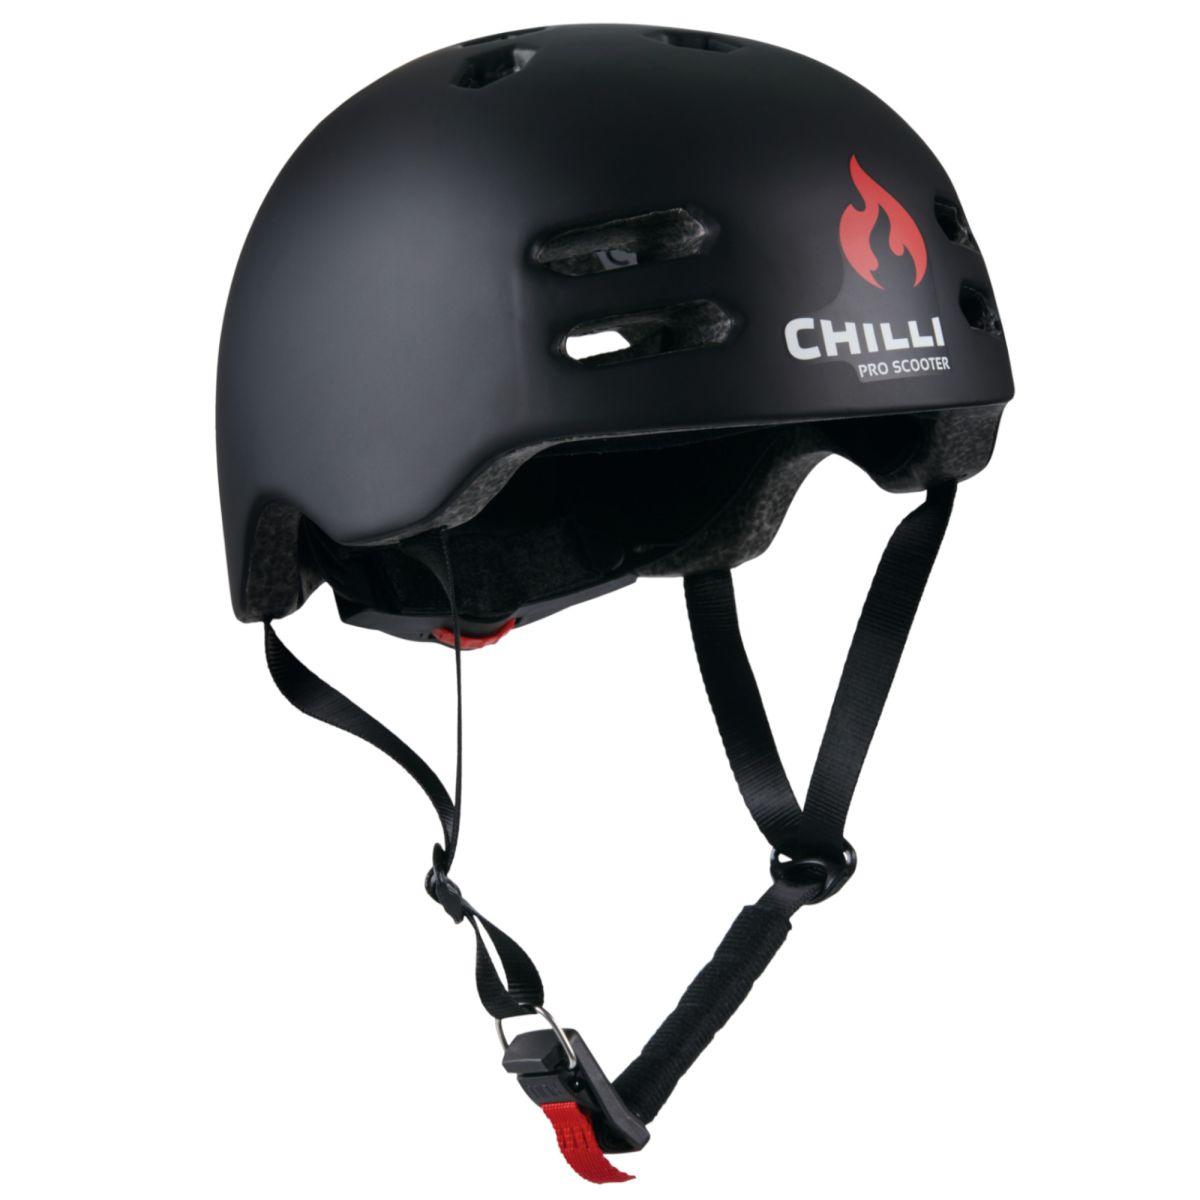 Obrázek Chilli helma Inmold černá S (53-55 cm)